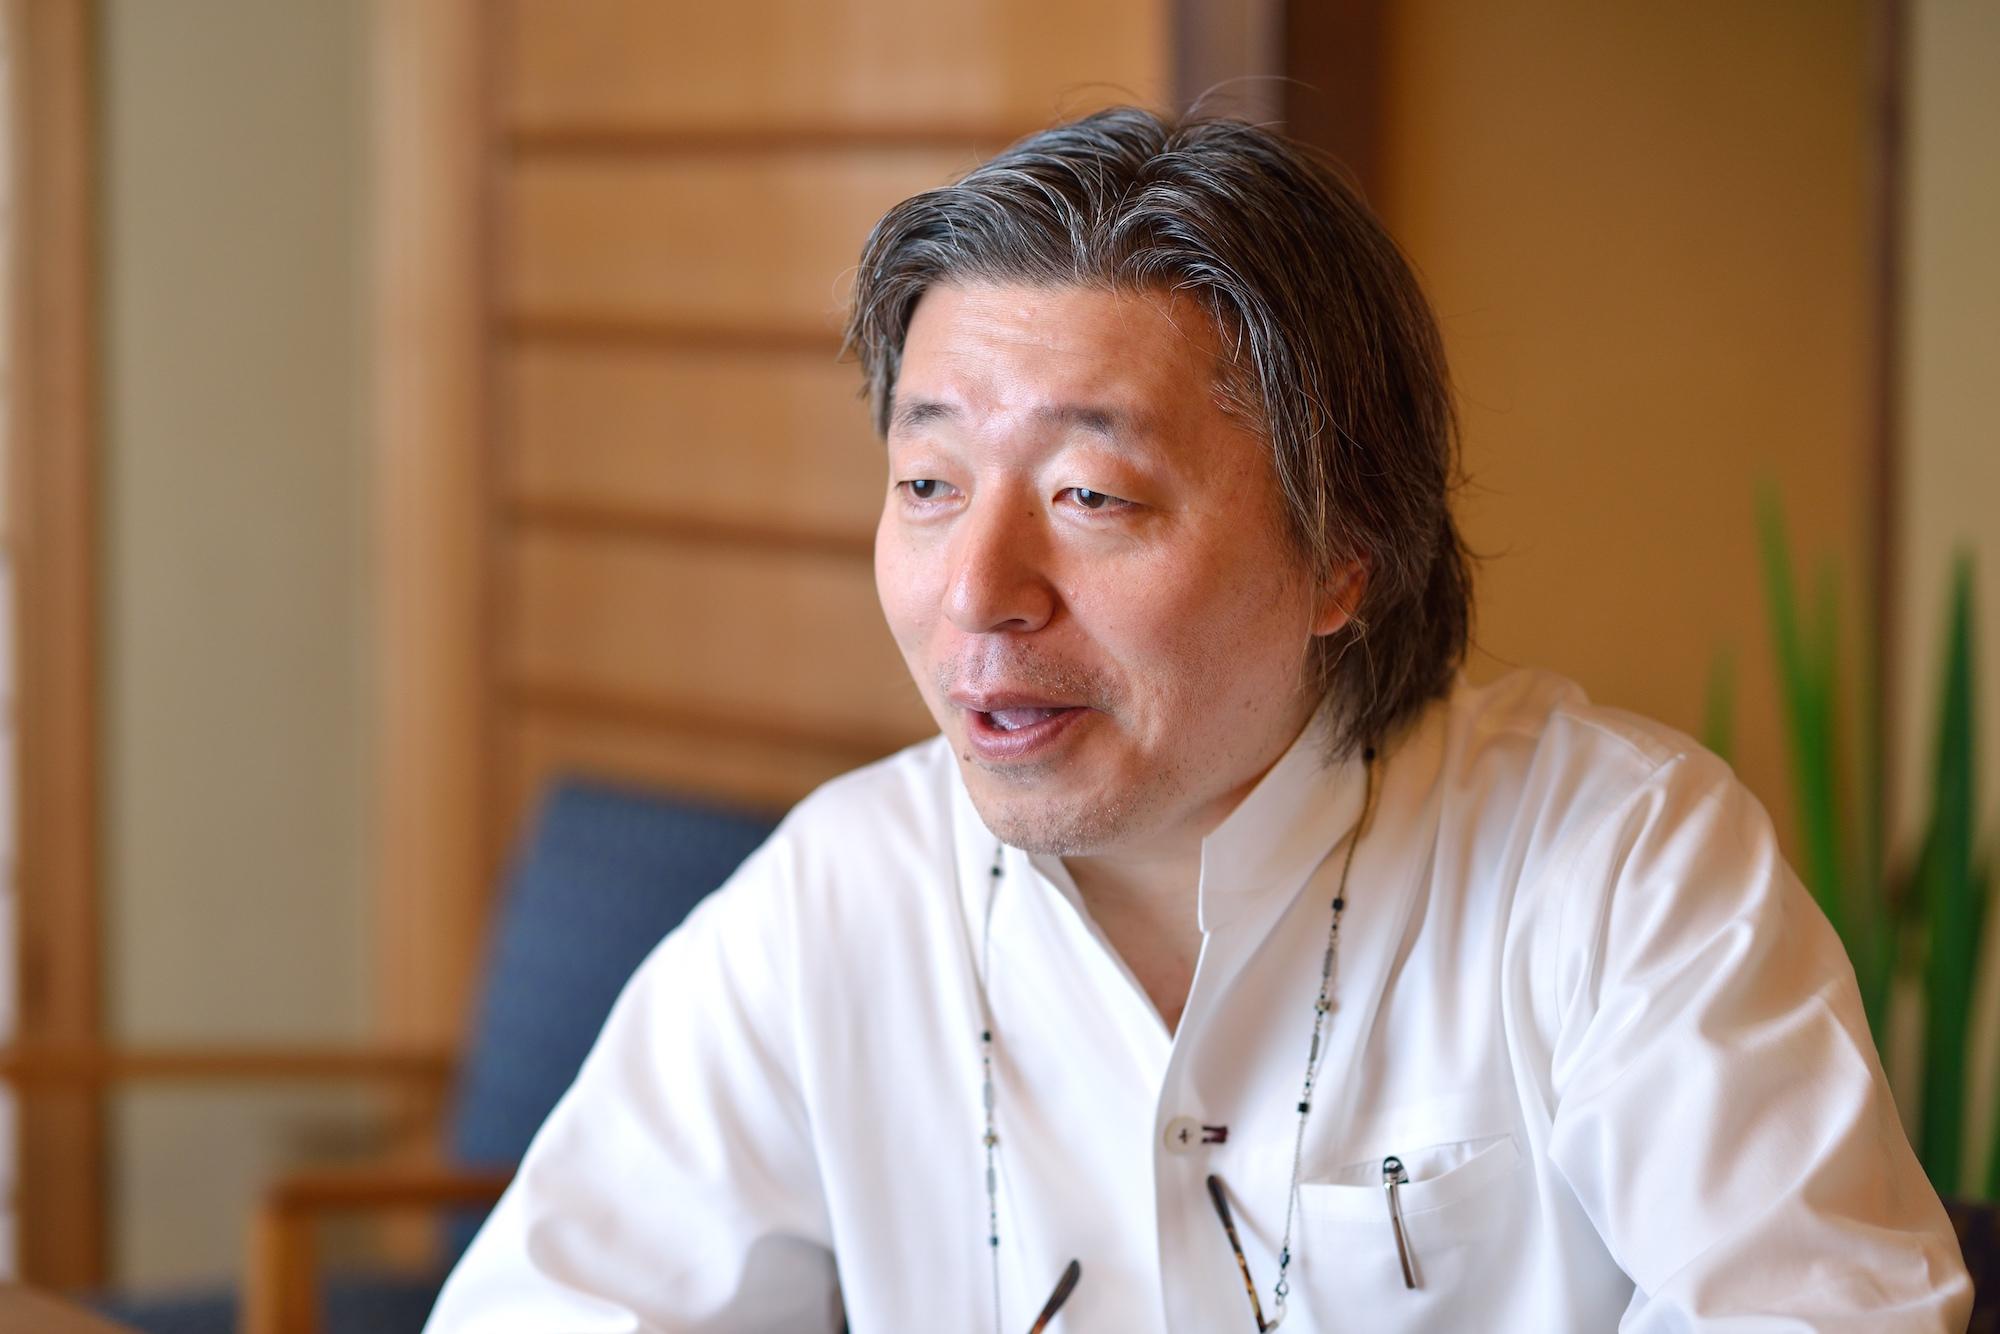 Yonemura Masayasu Yonemura